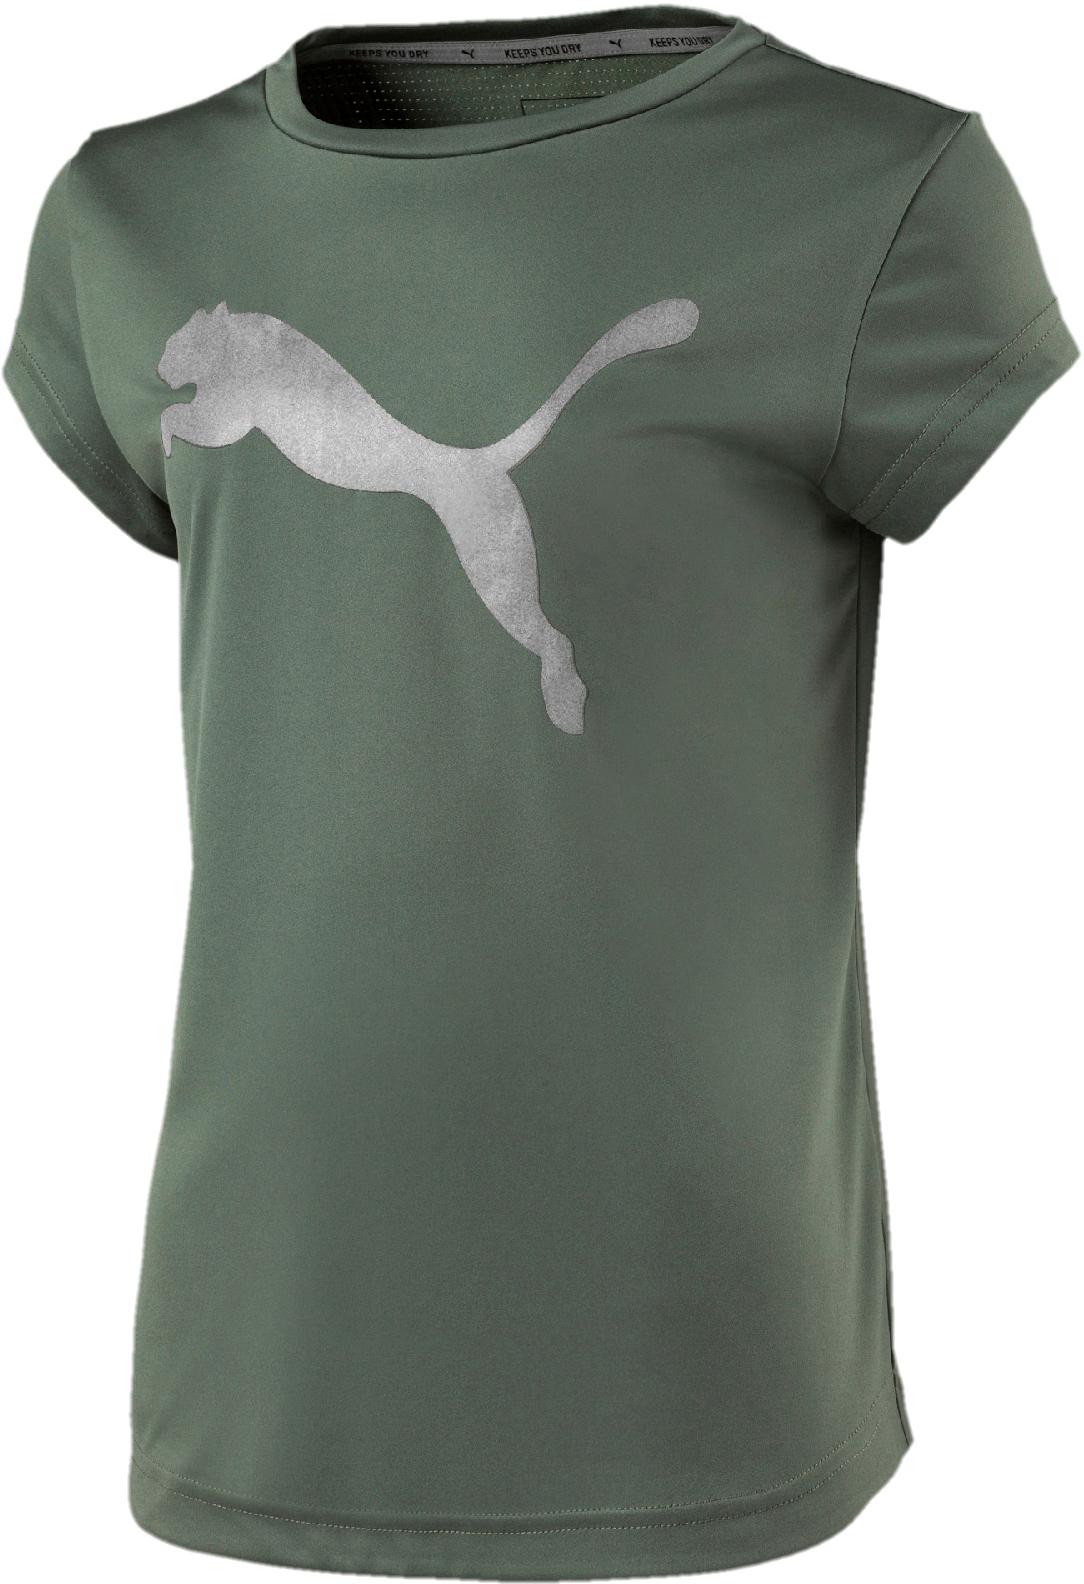 Футболка PUMA Explosive Graphic Tee G футболка мужская puma style athletics graphic tee цвет серый зеленый 85002839 размер xl 50 52